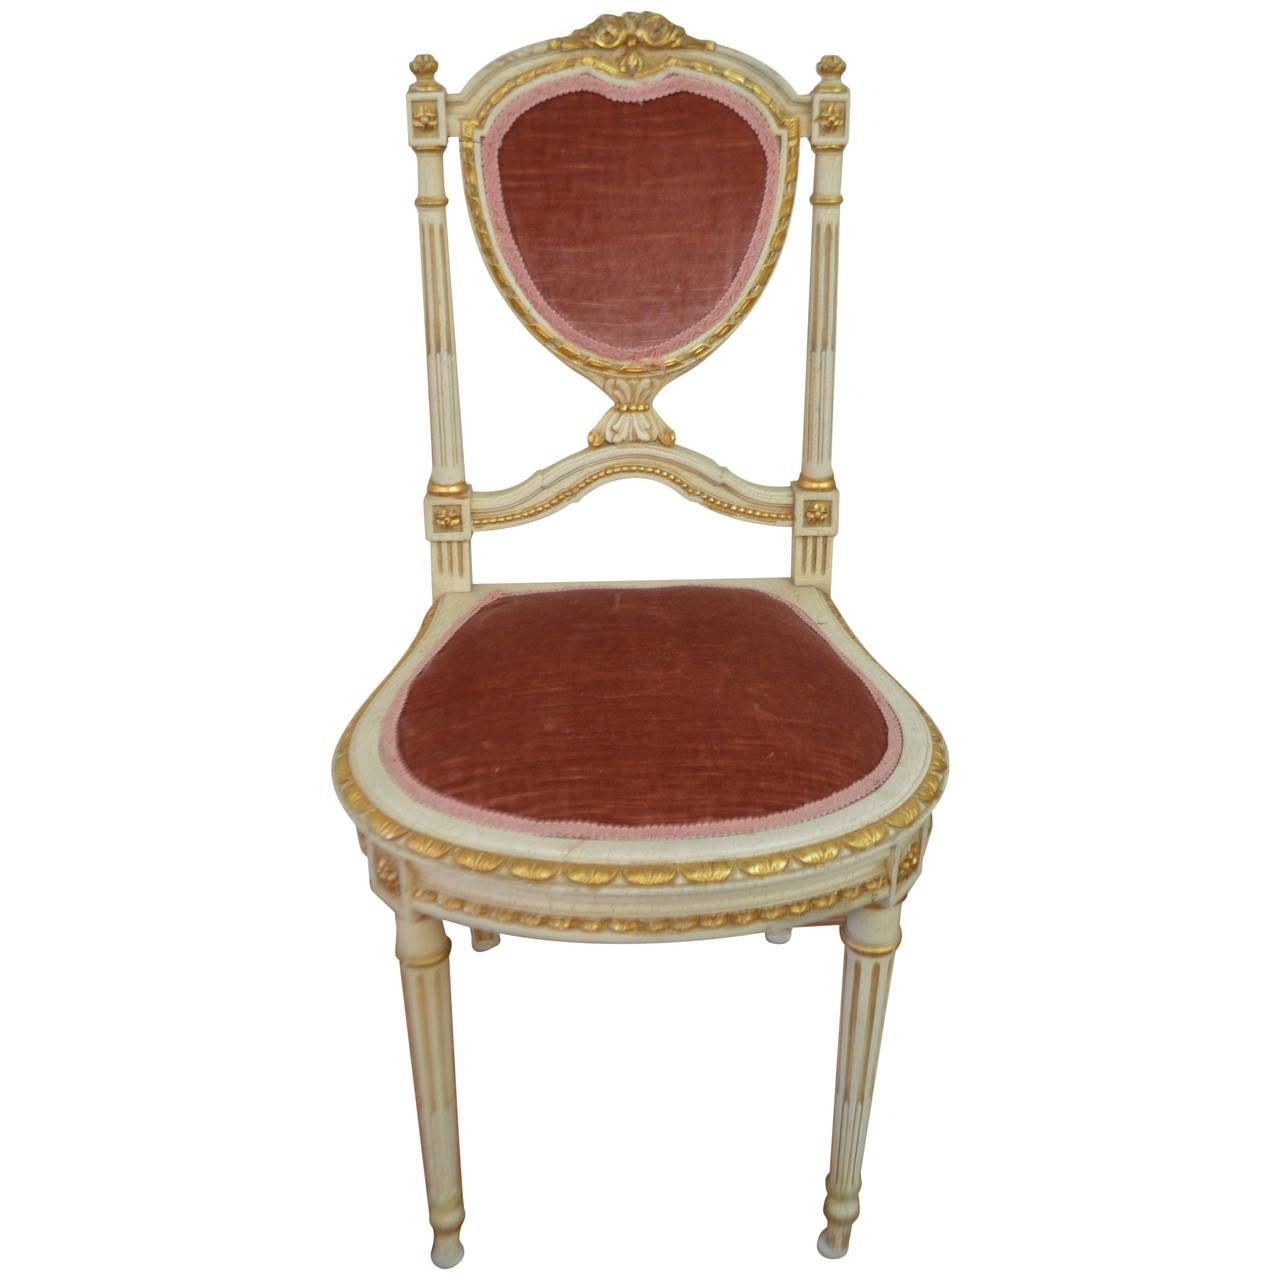 Antique louis xvi chair - Louis Xvi Style Heart Shape Backside Chair 1